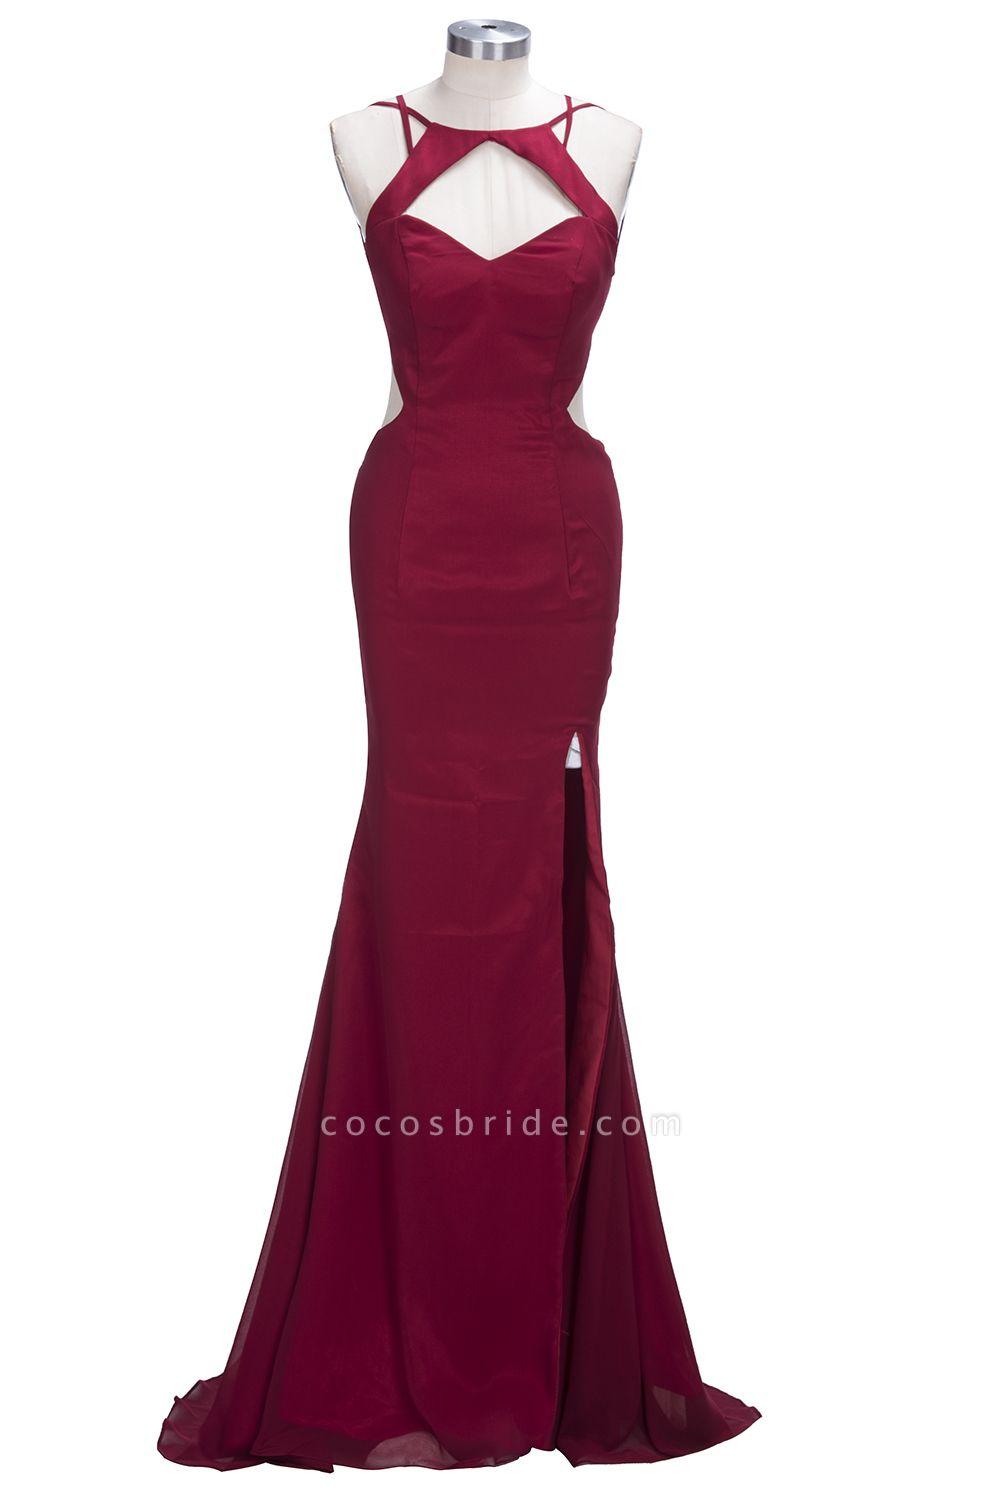 VICTORIA | Mermaid Sleeveless Long Cutouts Side Slit Burgundy Prom Dresses